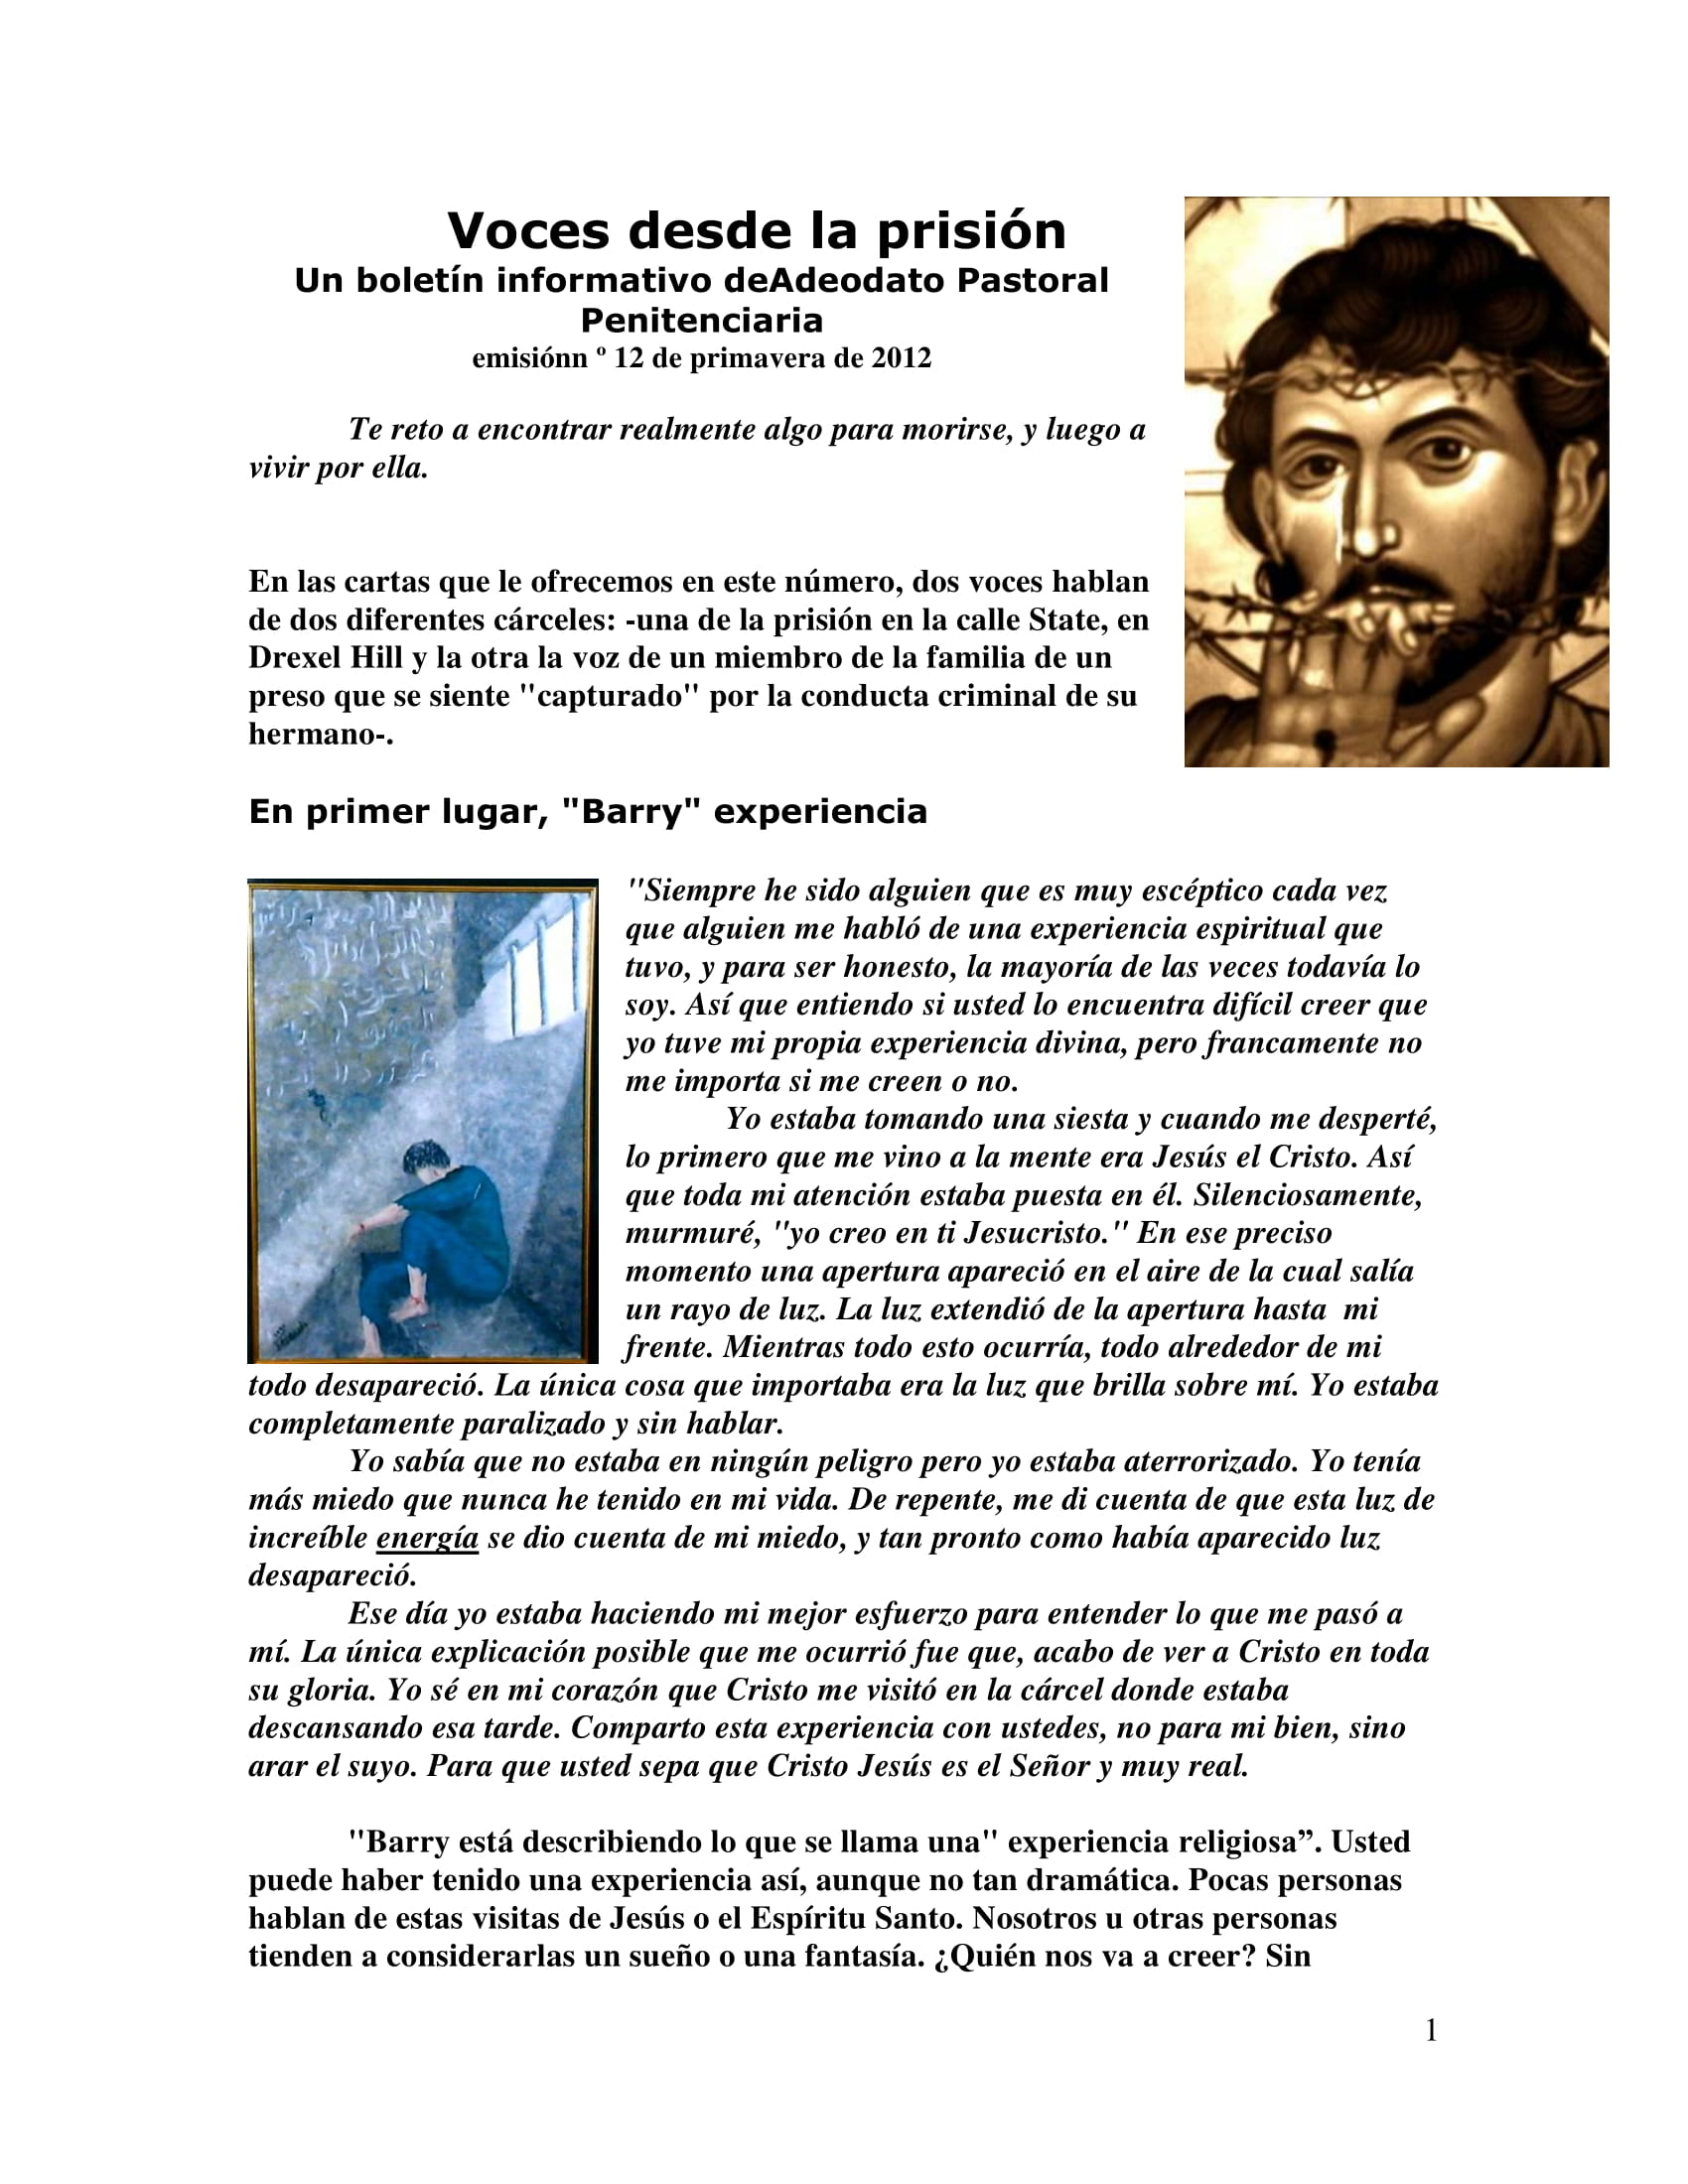 Voices From Prison 12 Spanish-1.jpg